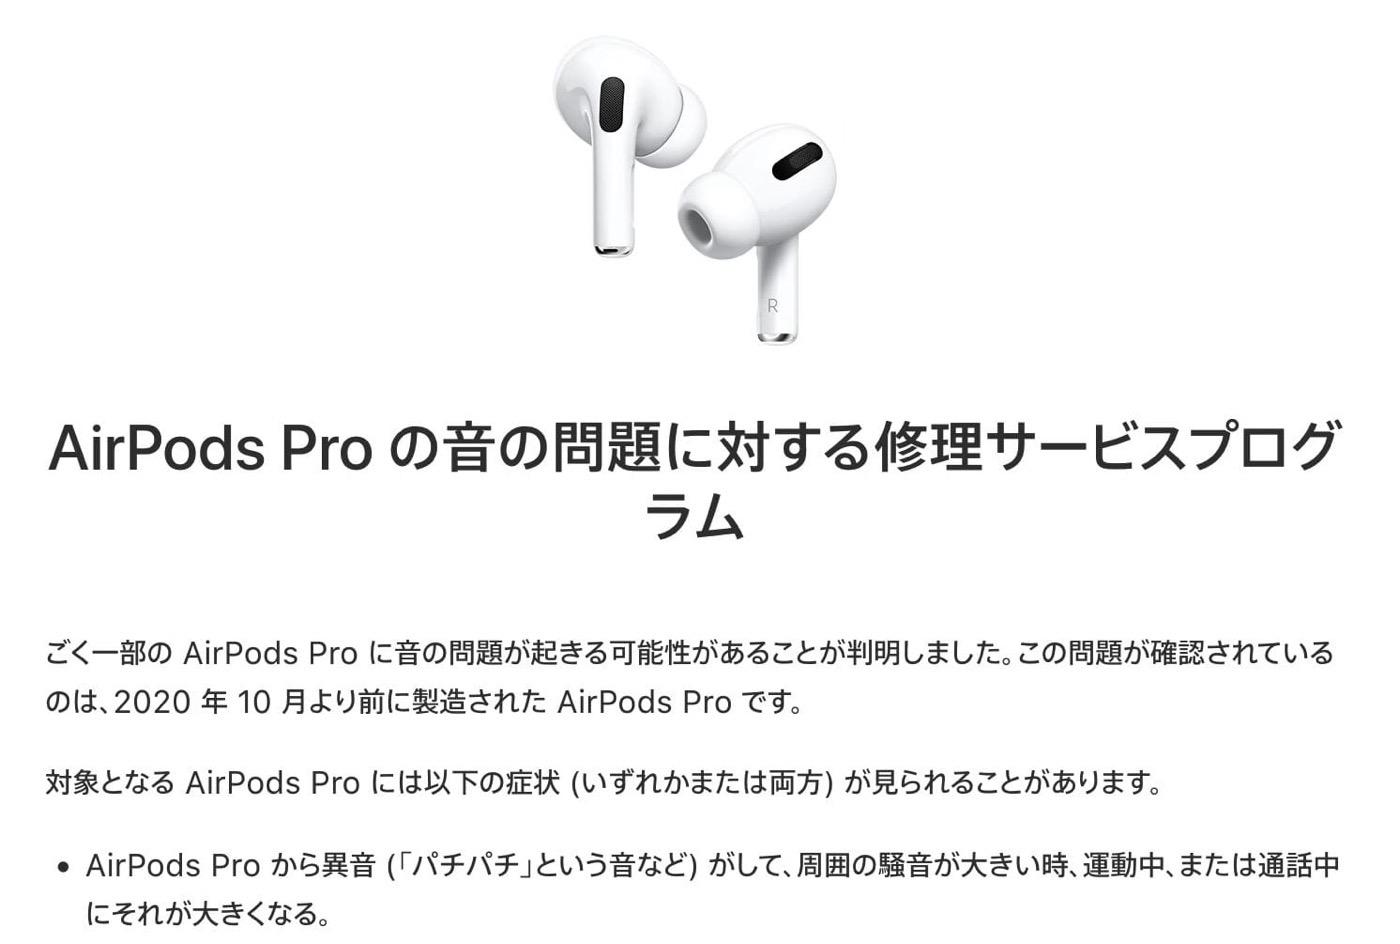 AirPodsPro soundissue repairprog